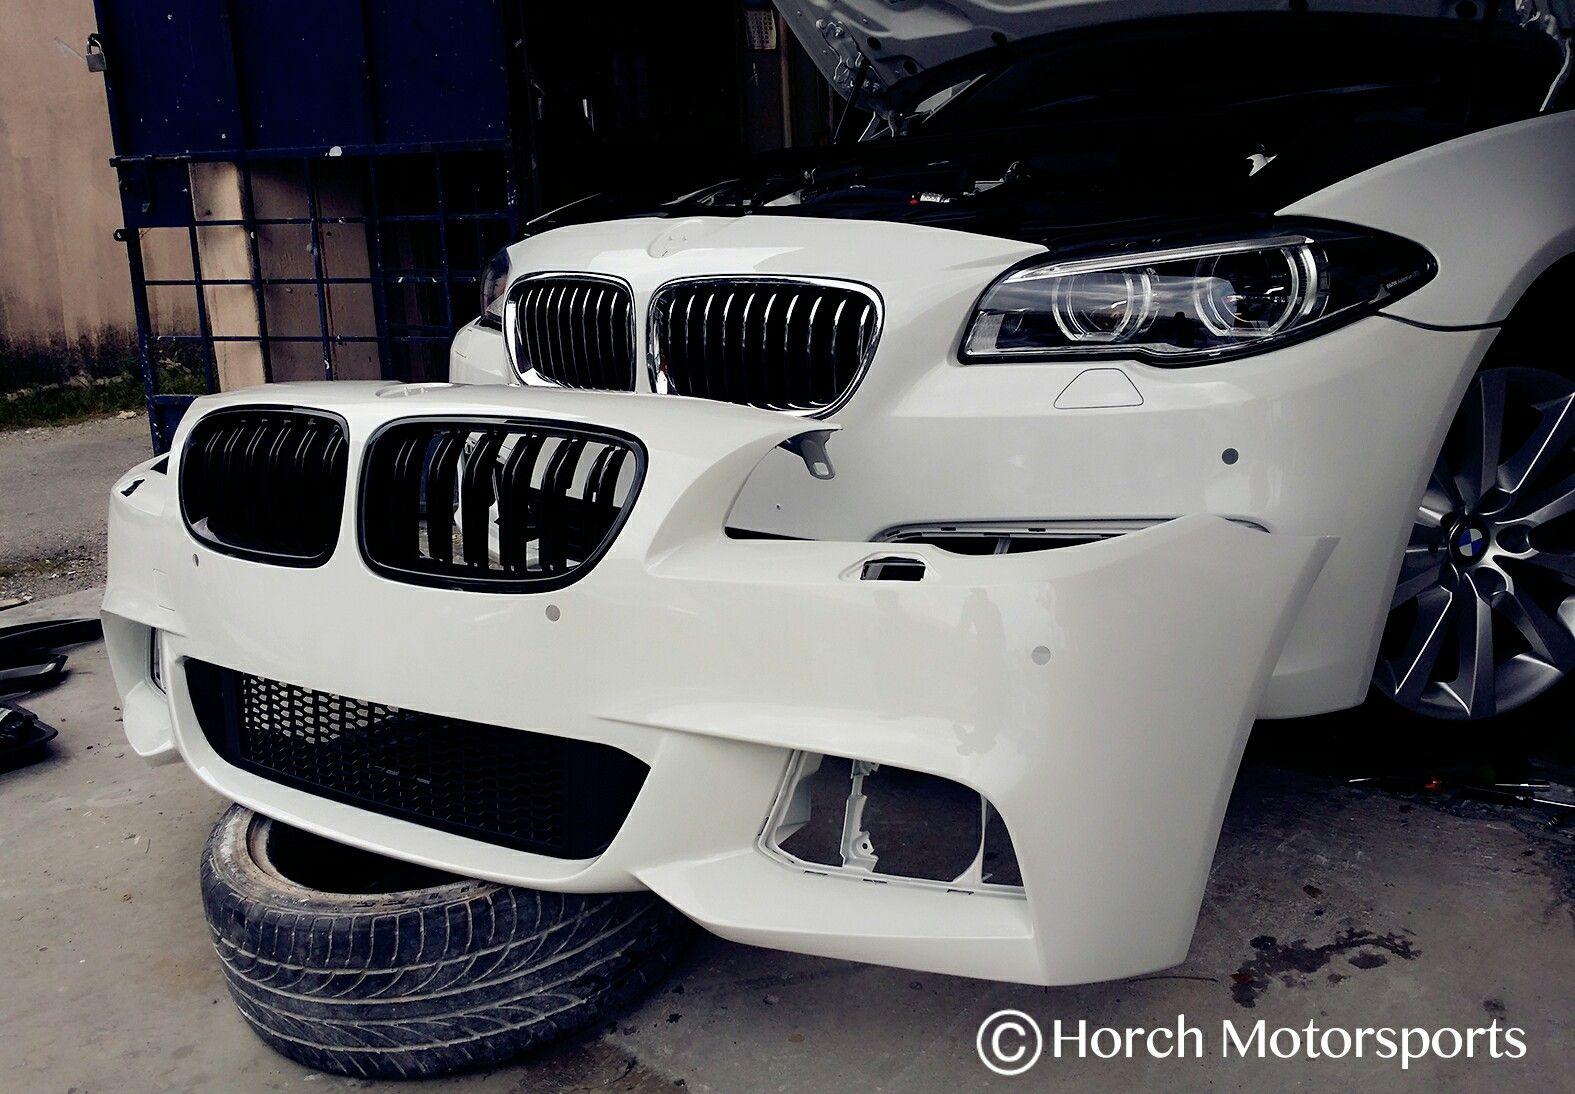 7e34d88b3da Taiwan No.1 Bimmer PP Body kit brand. Horch Motorsports 017-210 5779.  F10   Bimmer  5Series  MSport  HorchMotorsports  Bodykit  Bumper  BMW   MPerformance   ...